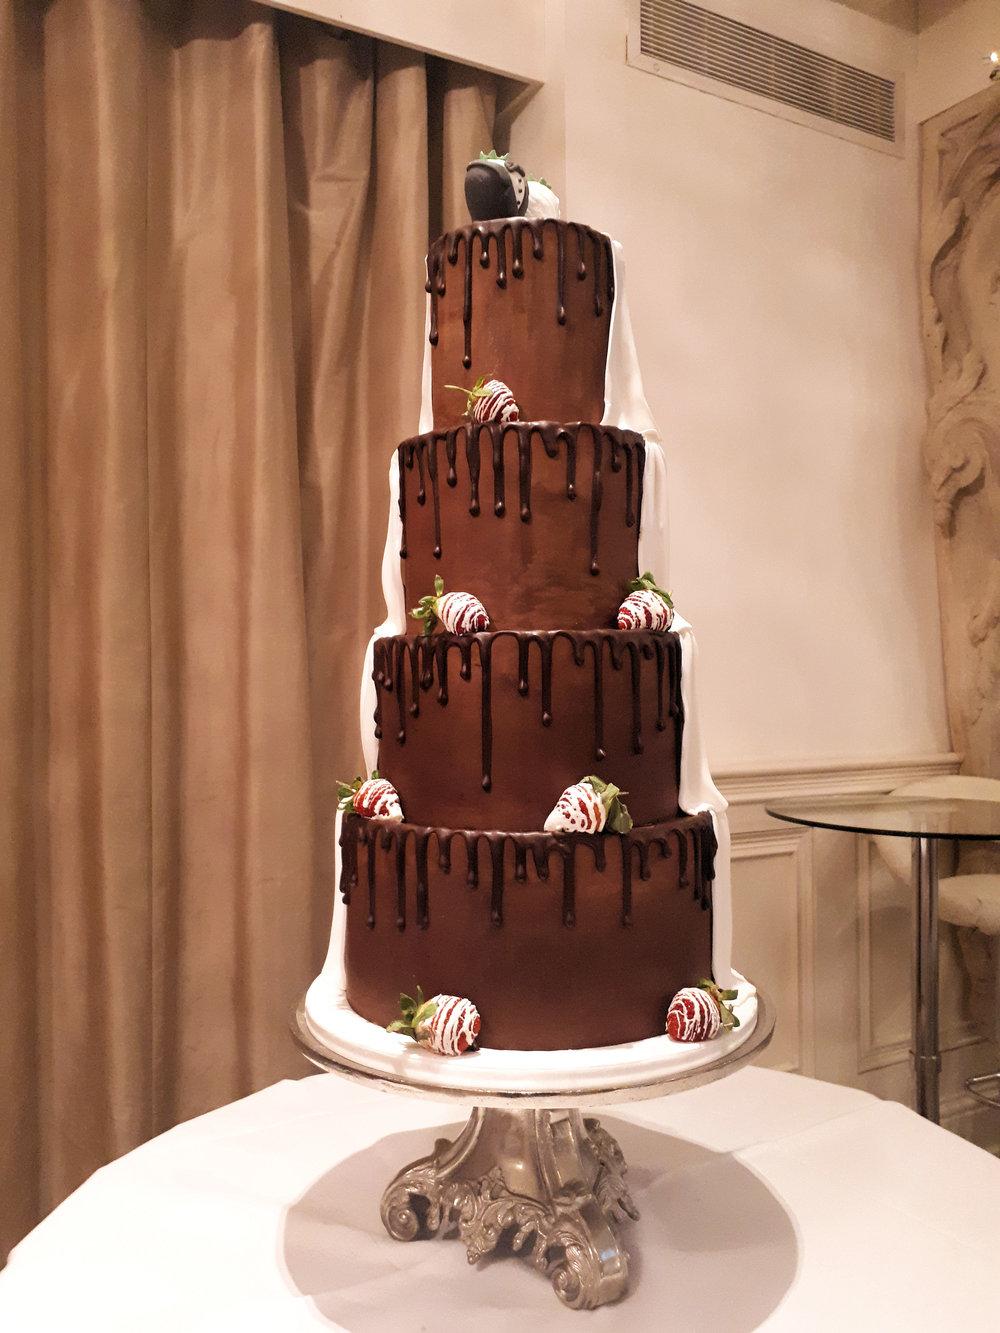 Half and half wedding cake 2.jpg